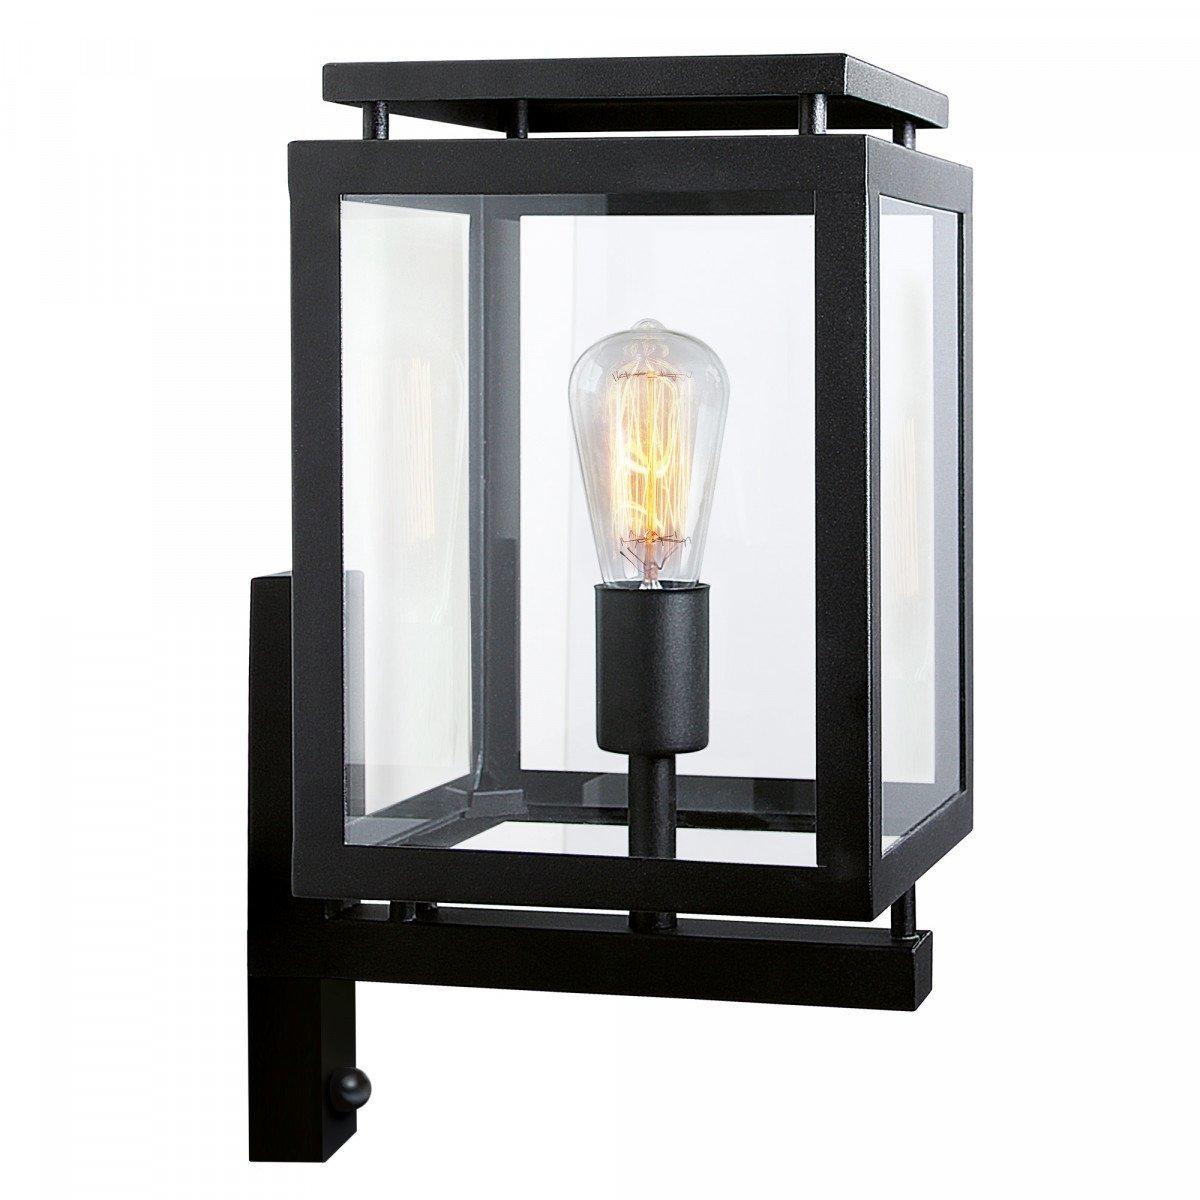 KS Lighting De Vecht mit Bewegungssensor - Beliebte moderne elegante klassische Außenbeleuchtung - Edelstahl